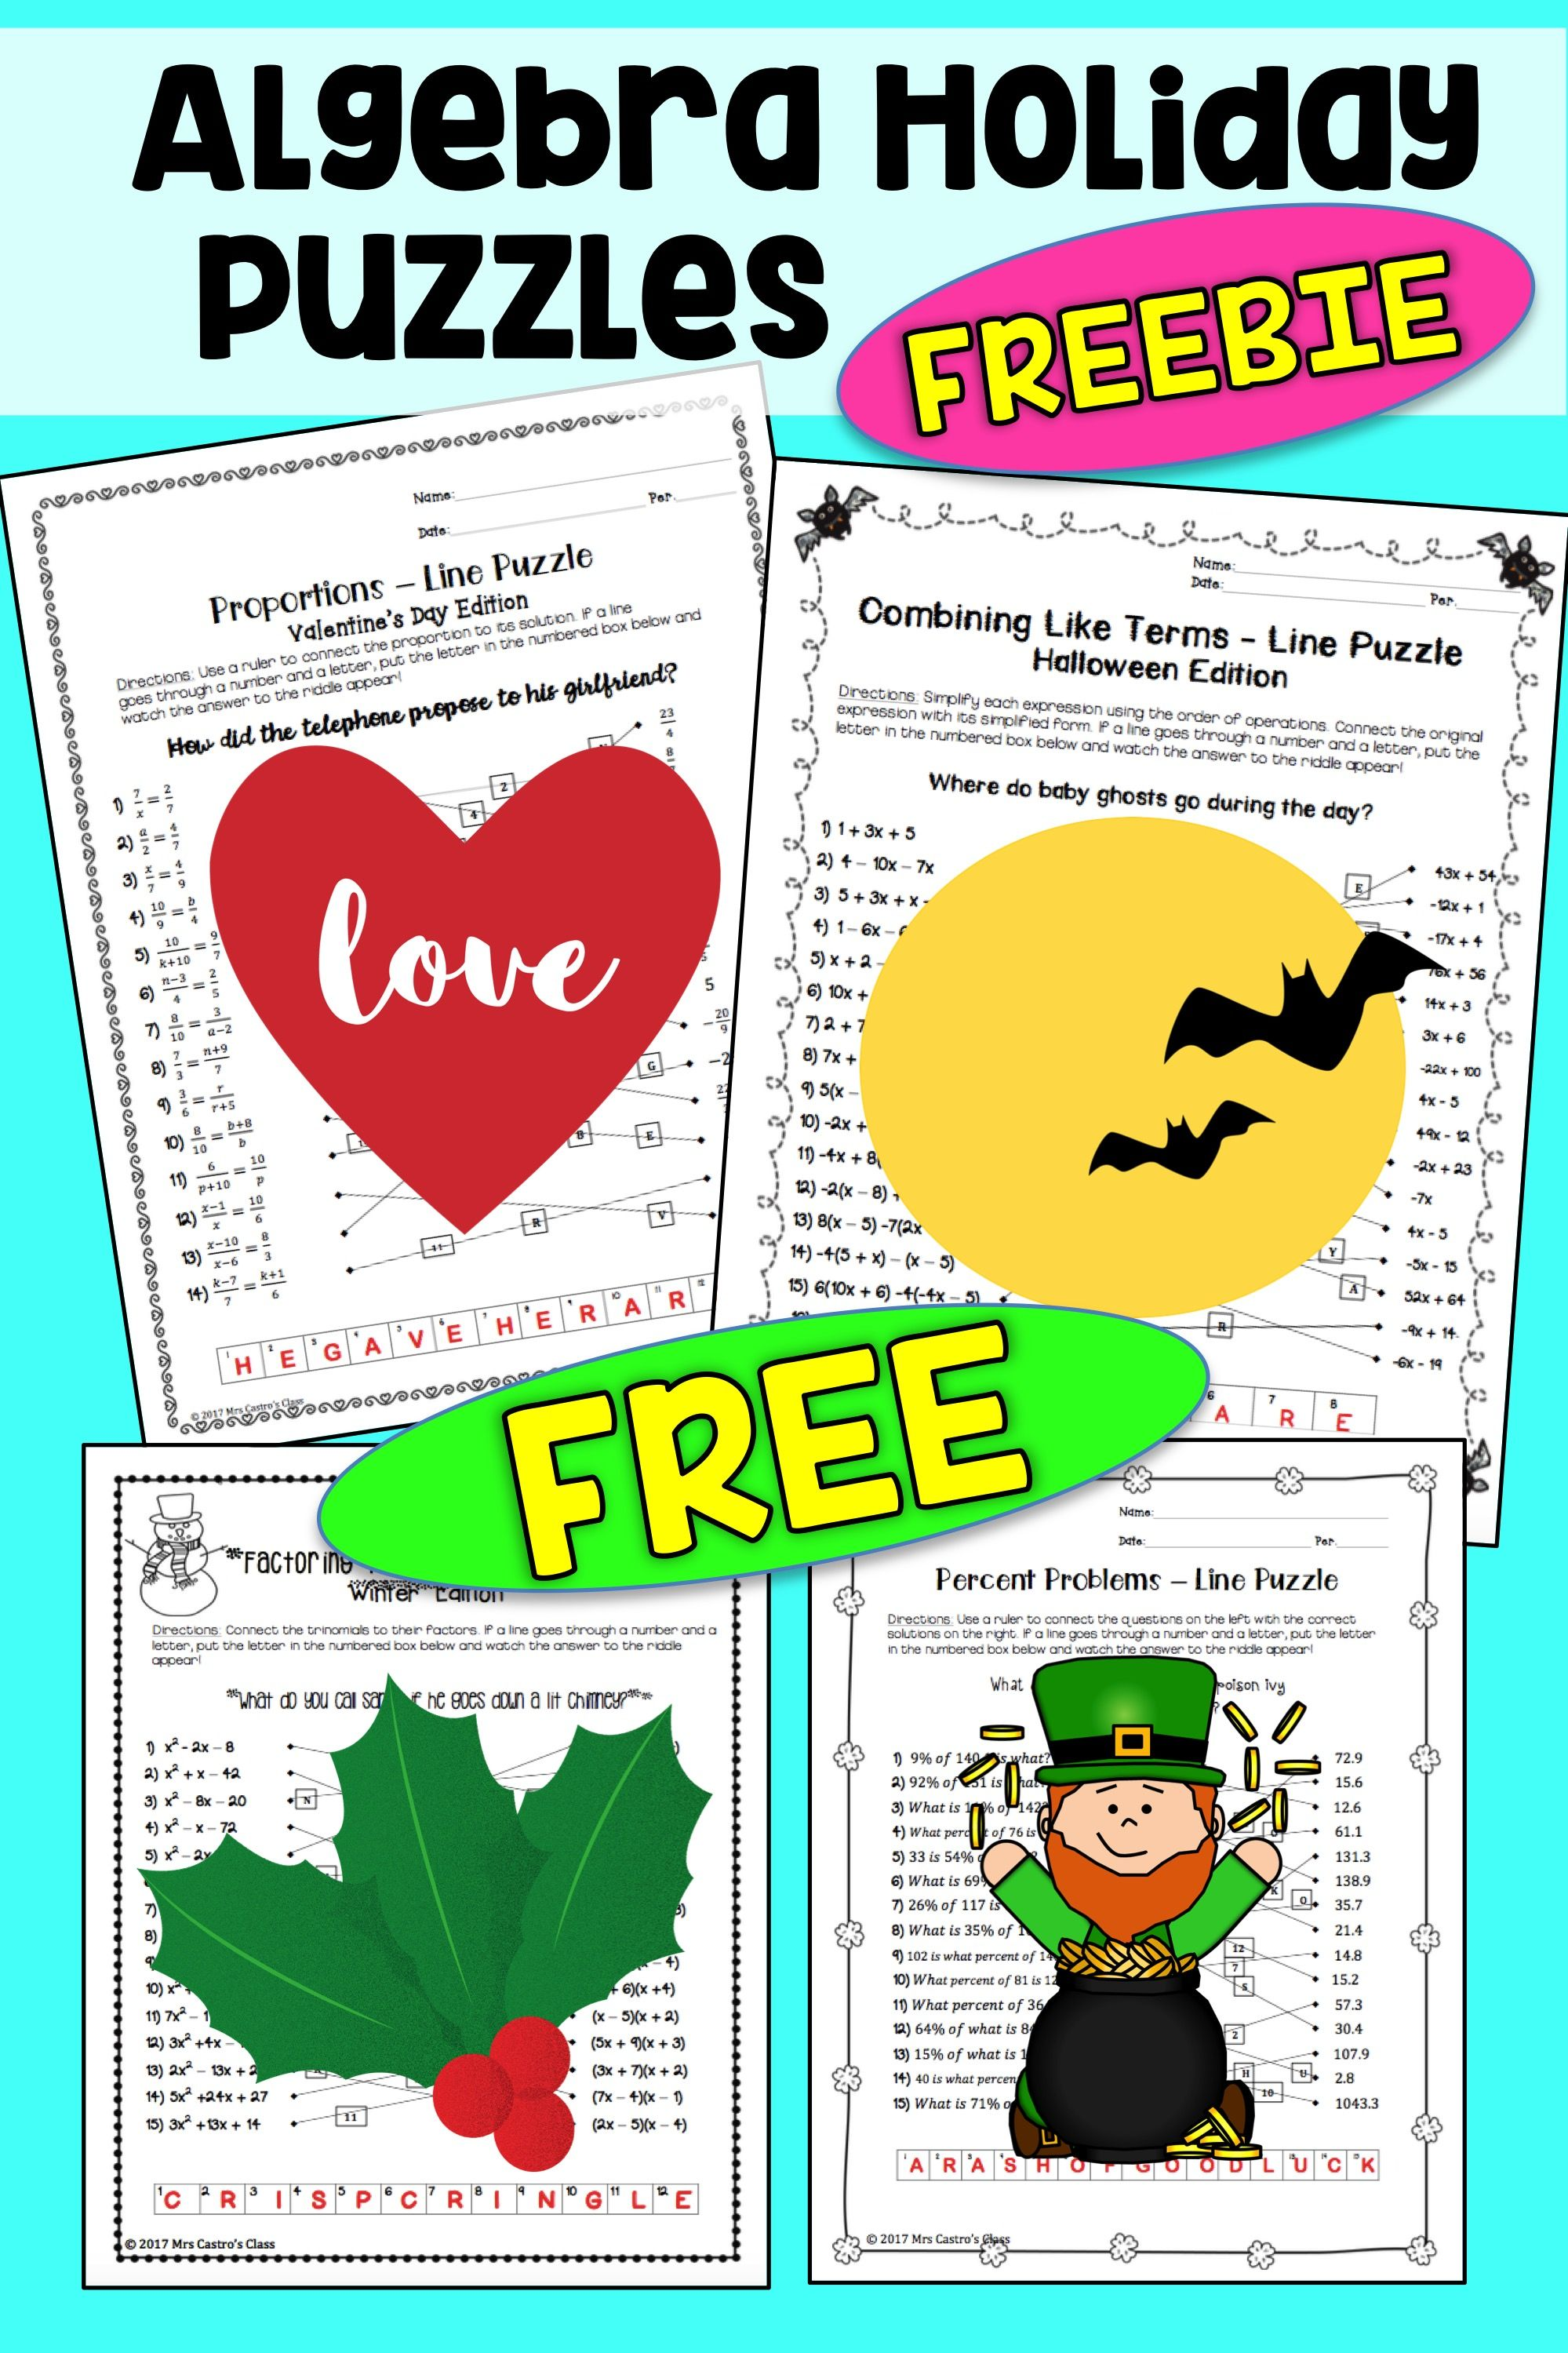 Free Algebra Holiday Puzzles